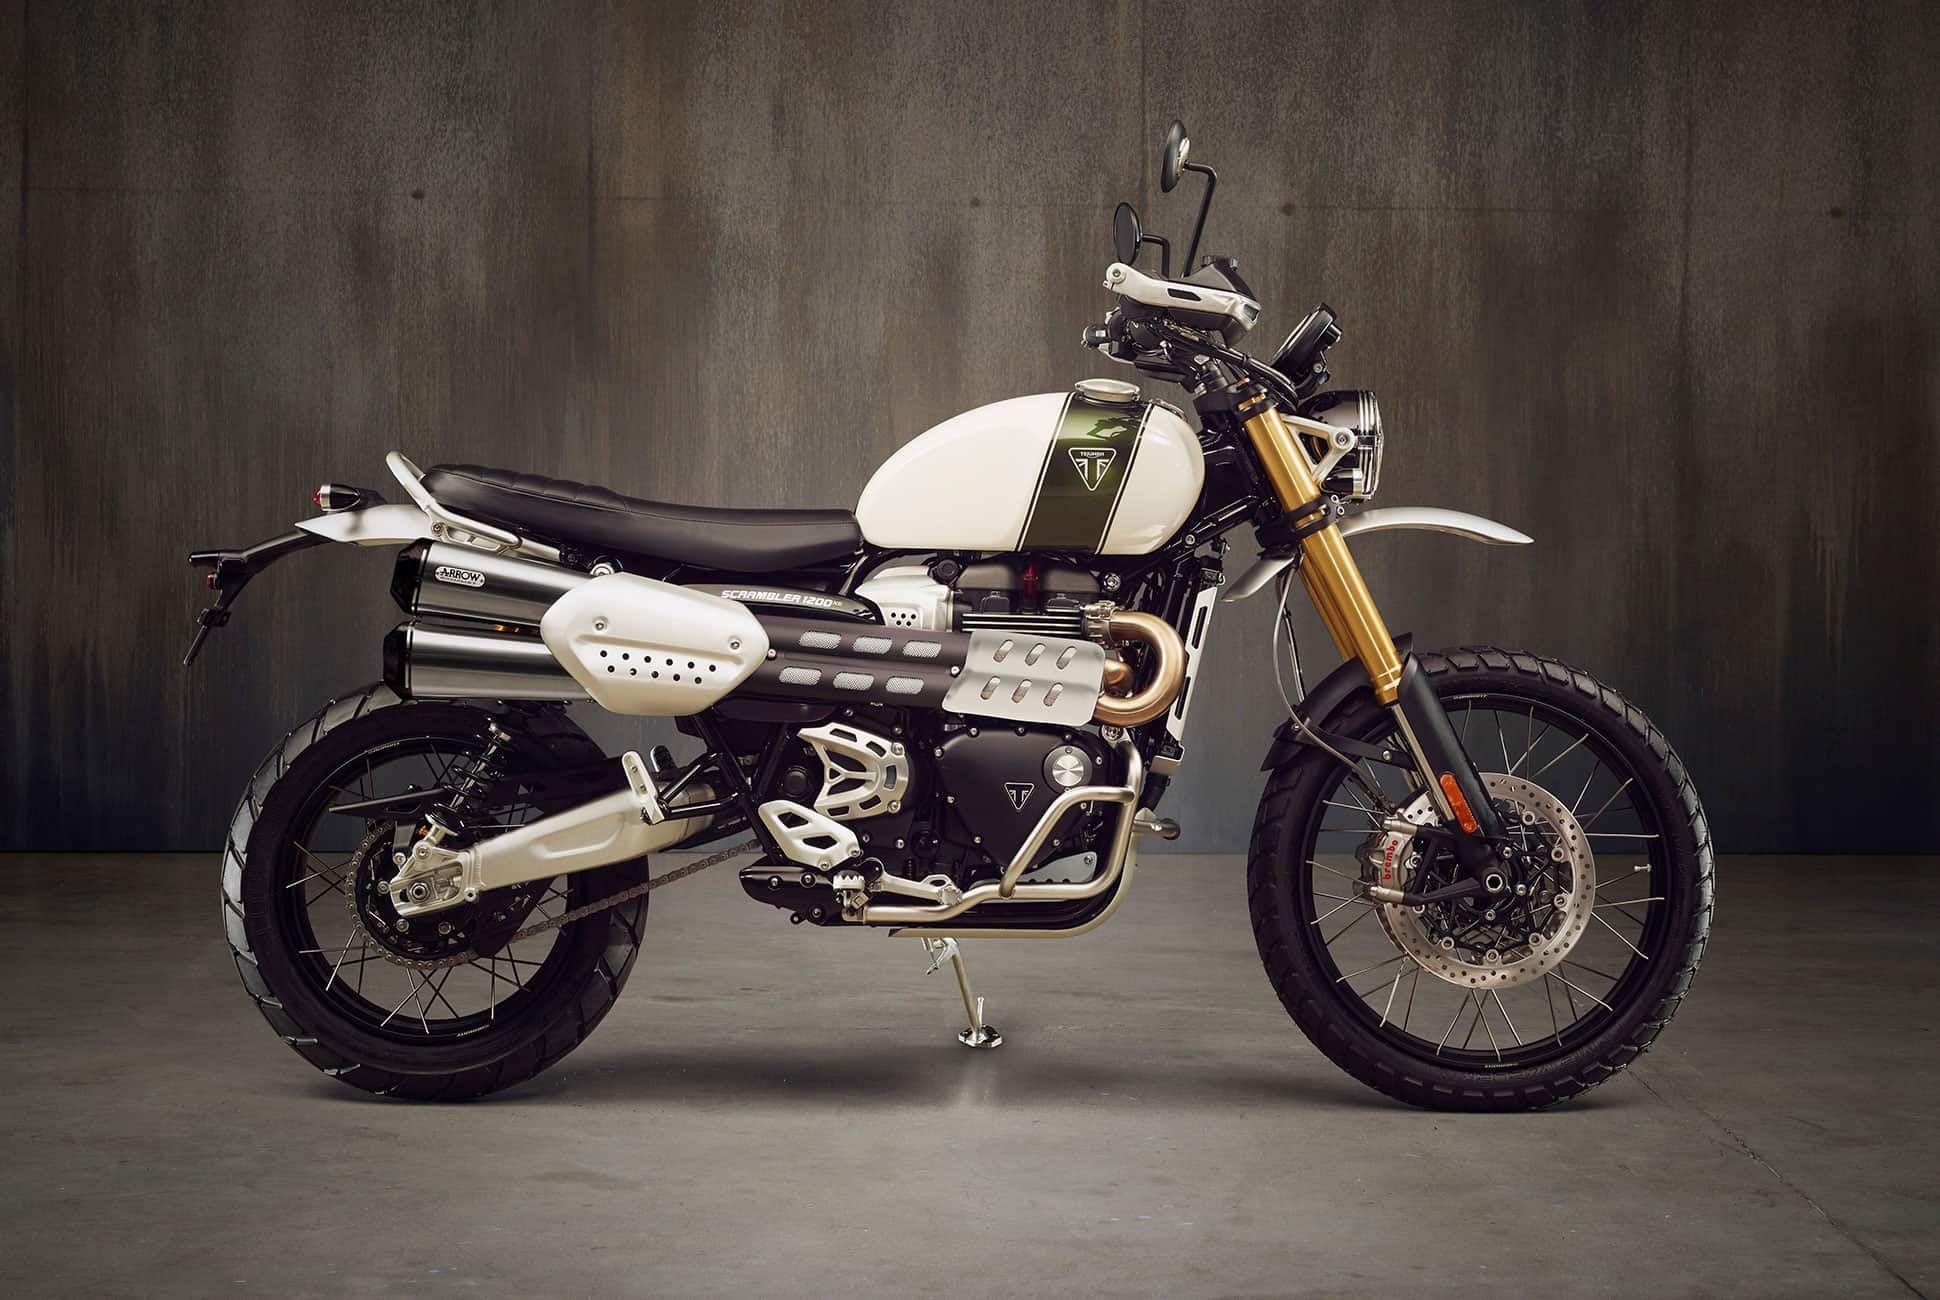 Triumph-Scrambler-1200-gear-patrol-slide-01